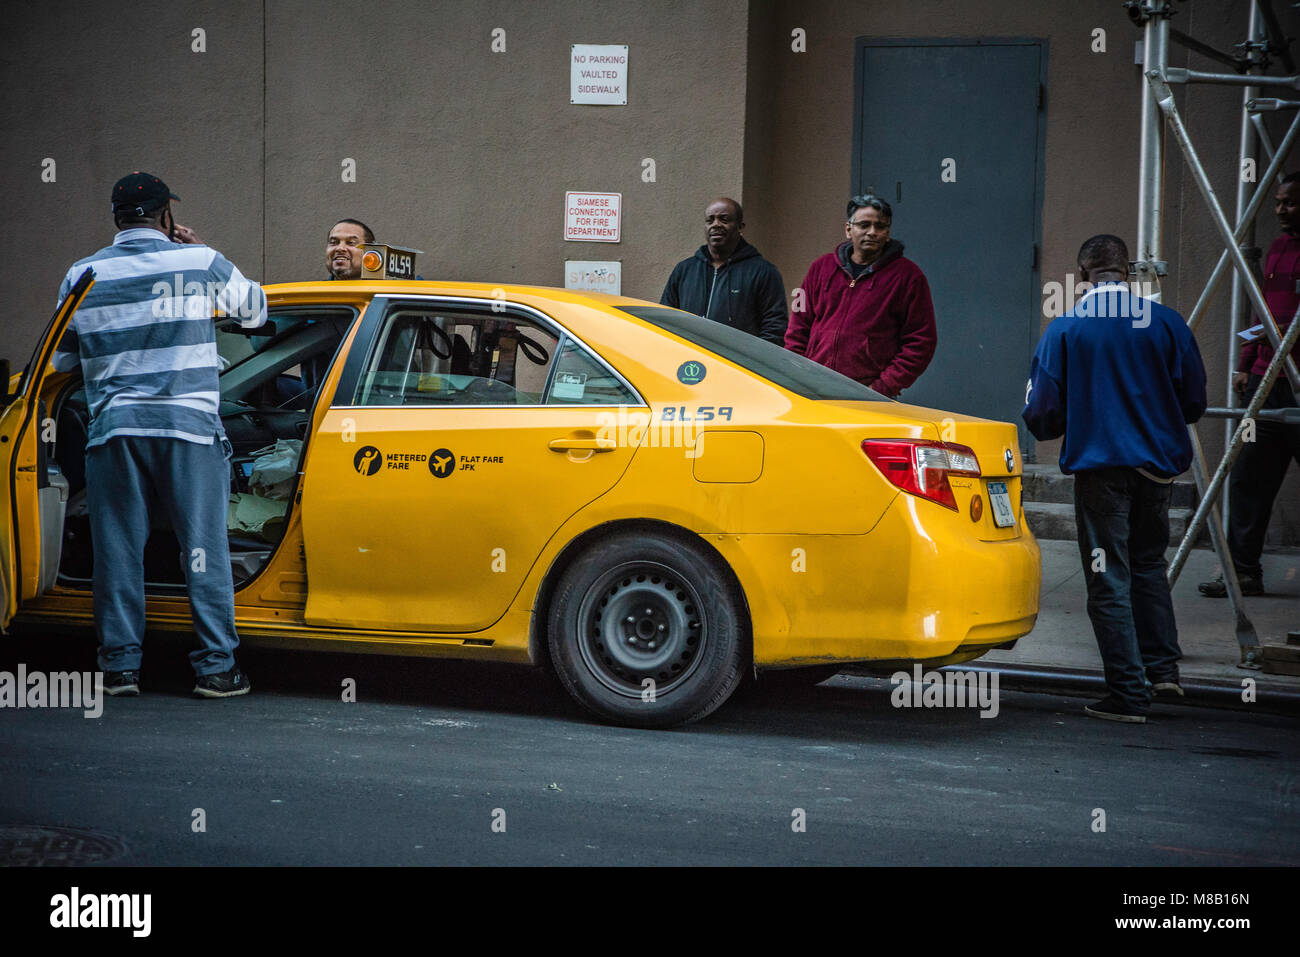 Nyc Taxi Garage Stock Photos & Nyc Taxi Garage Stock Images